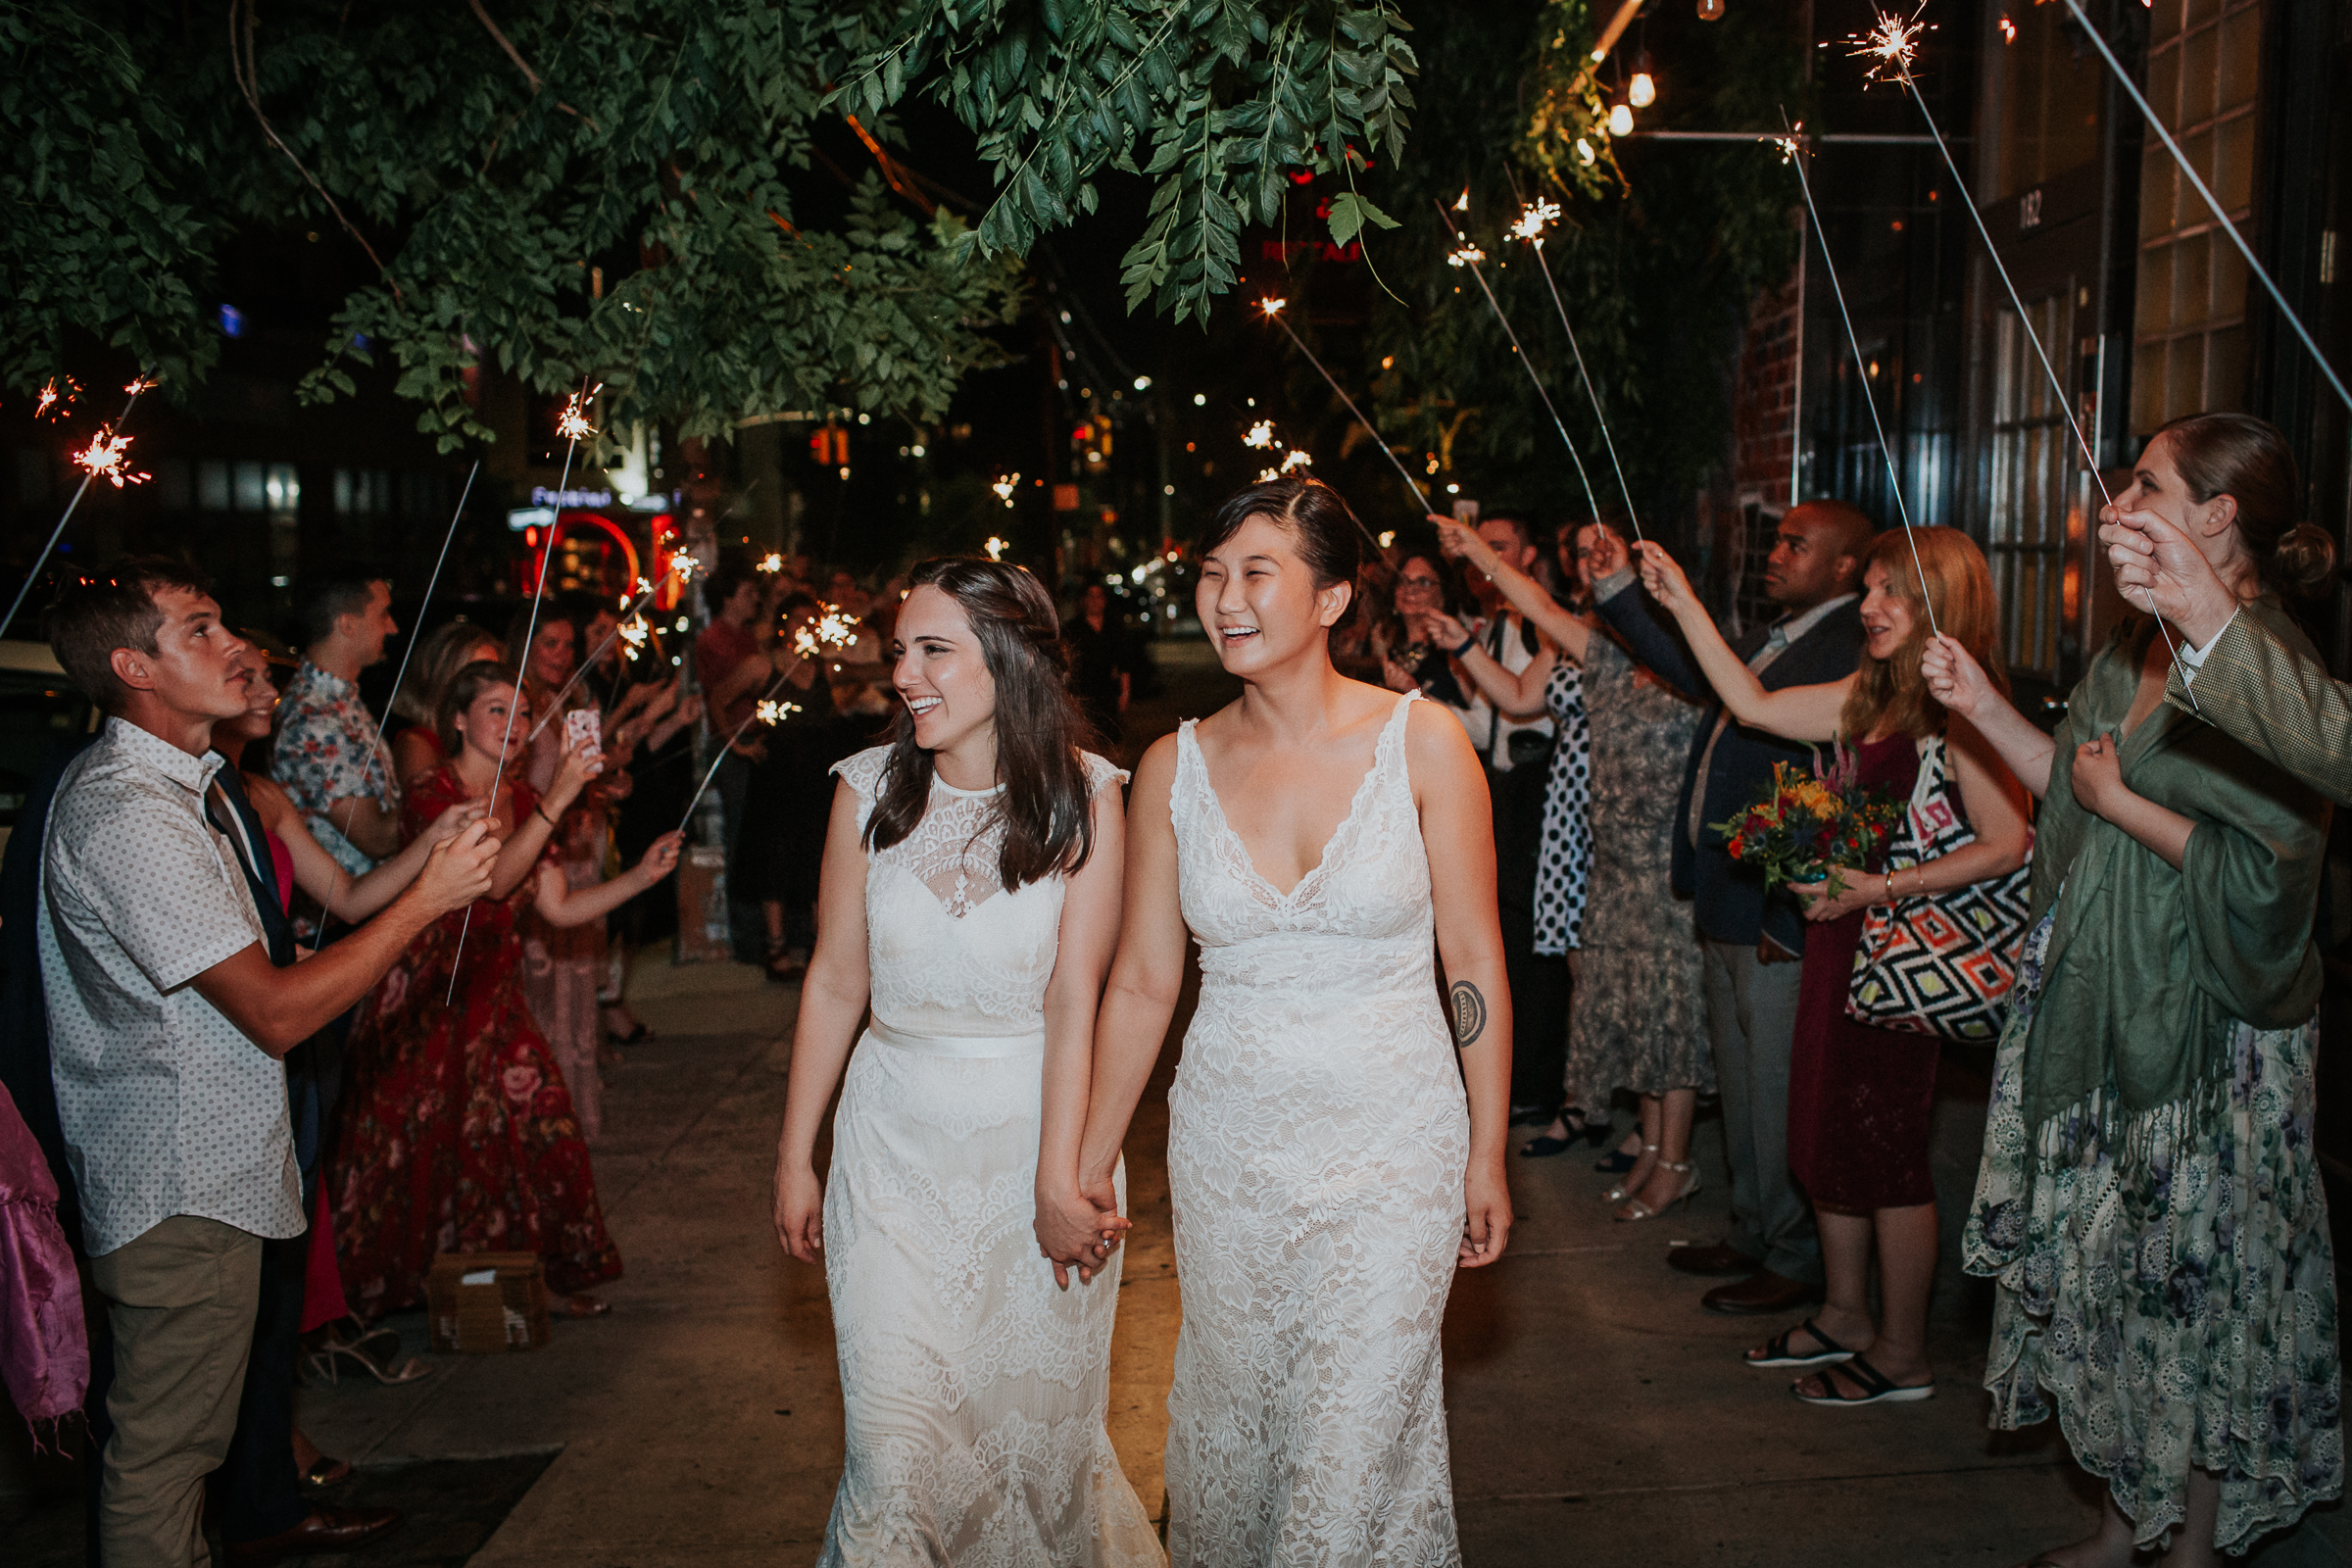 My-Moon-Brooklyn-LGBT-Gay-Documentary-Wedding-Photographer-125.jpg